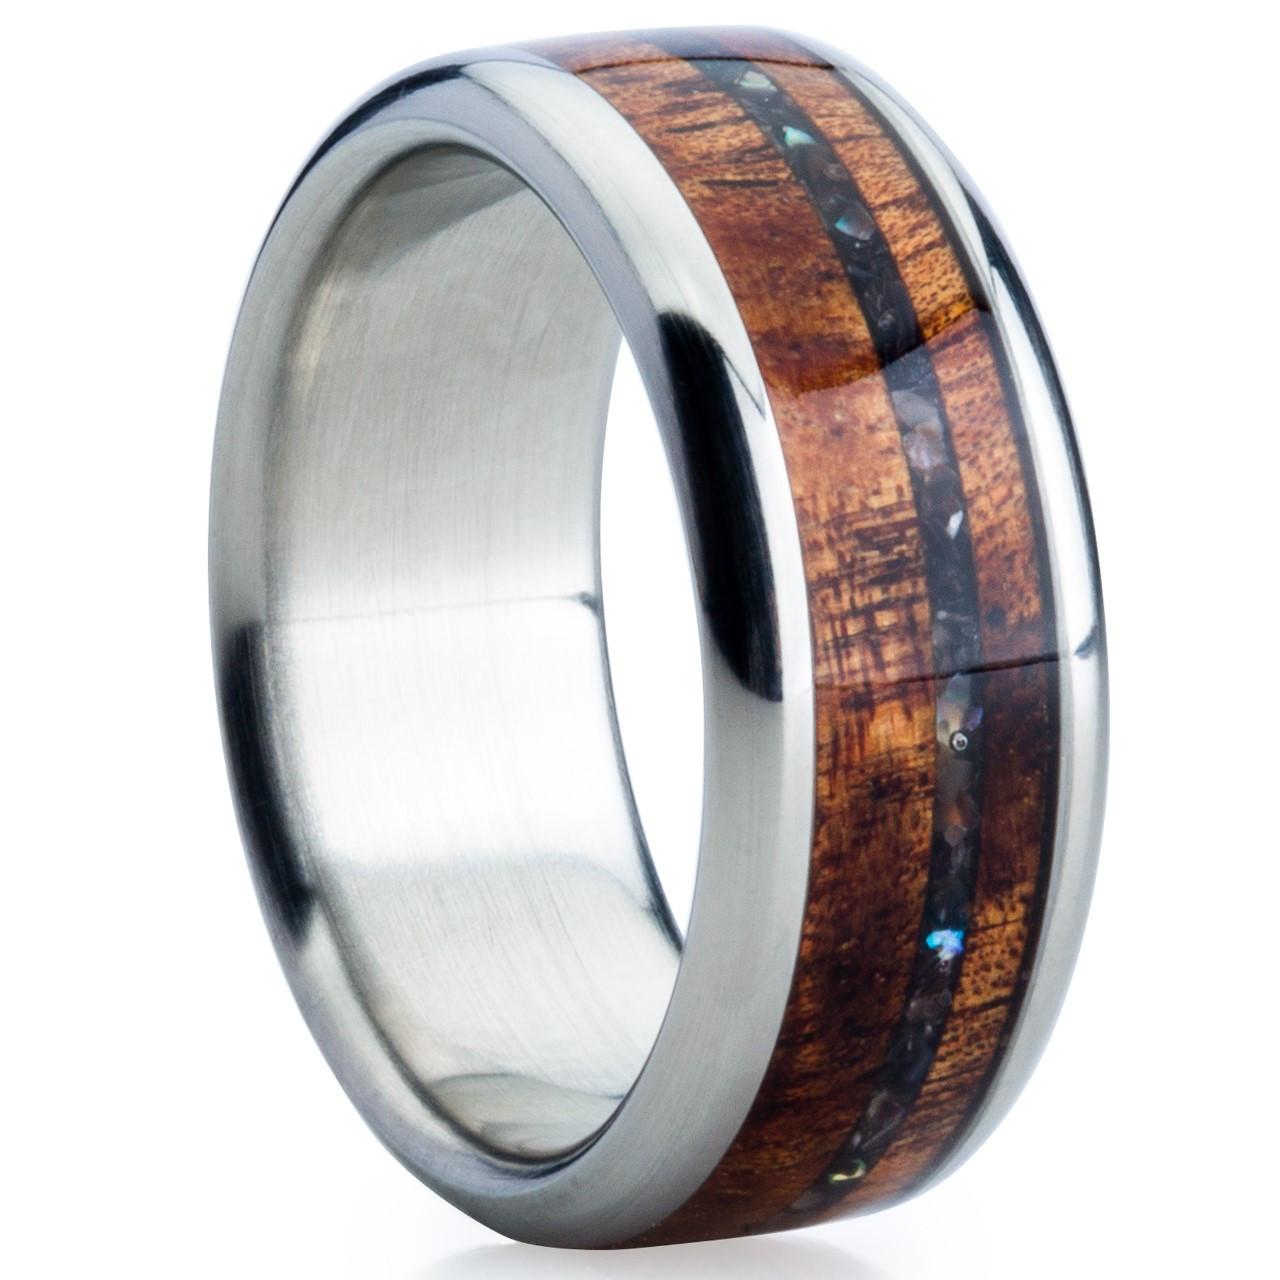 Thumbnailbp777h845861478837899c2imbypasson: Koa Inlay Wedding Ring At Websimilar.org